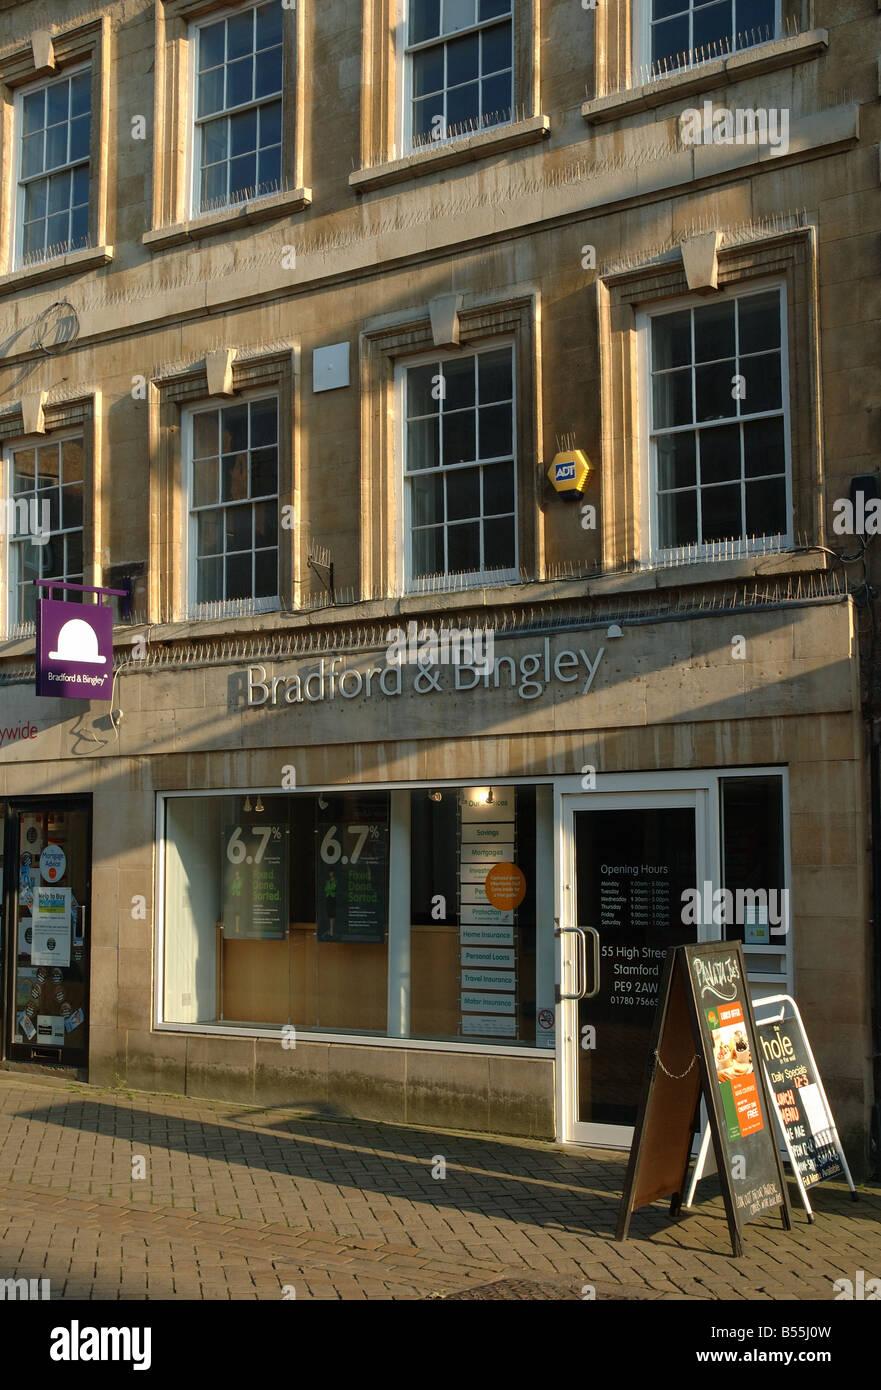 Bradford & Bingley branch, Stamford, Lincolnshire, England, UK - Stock Image